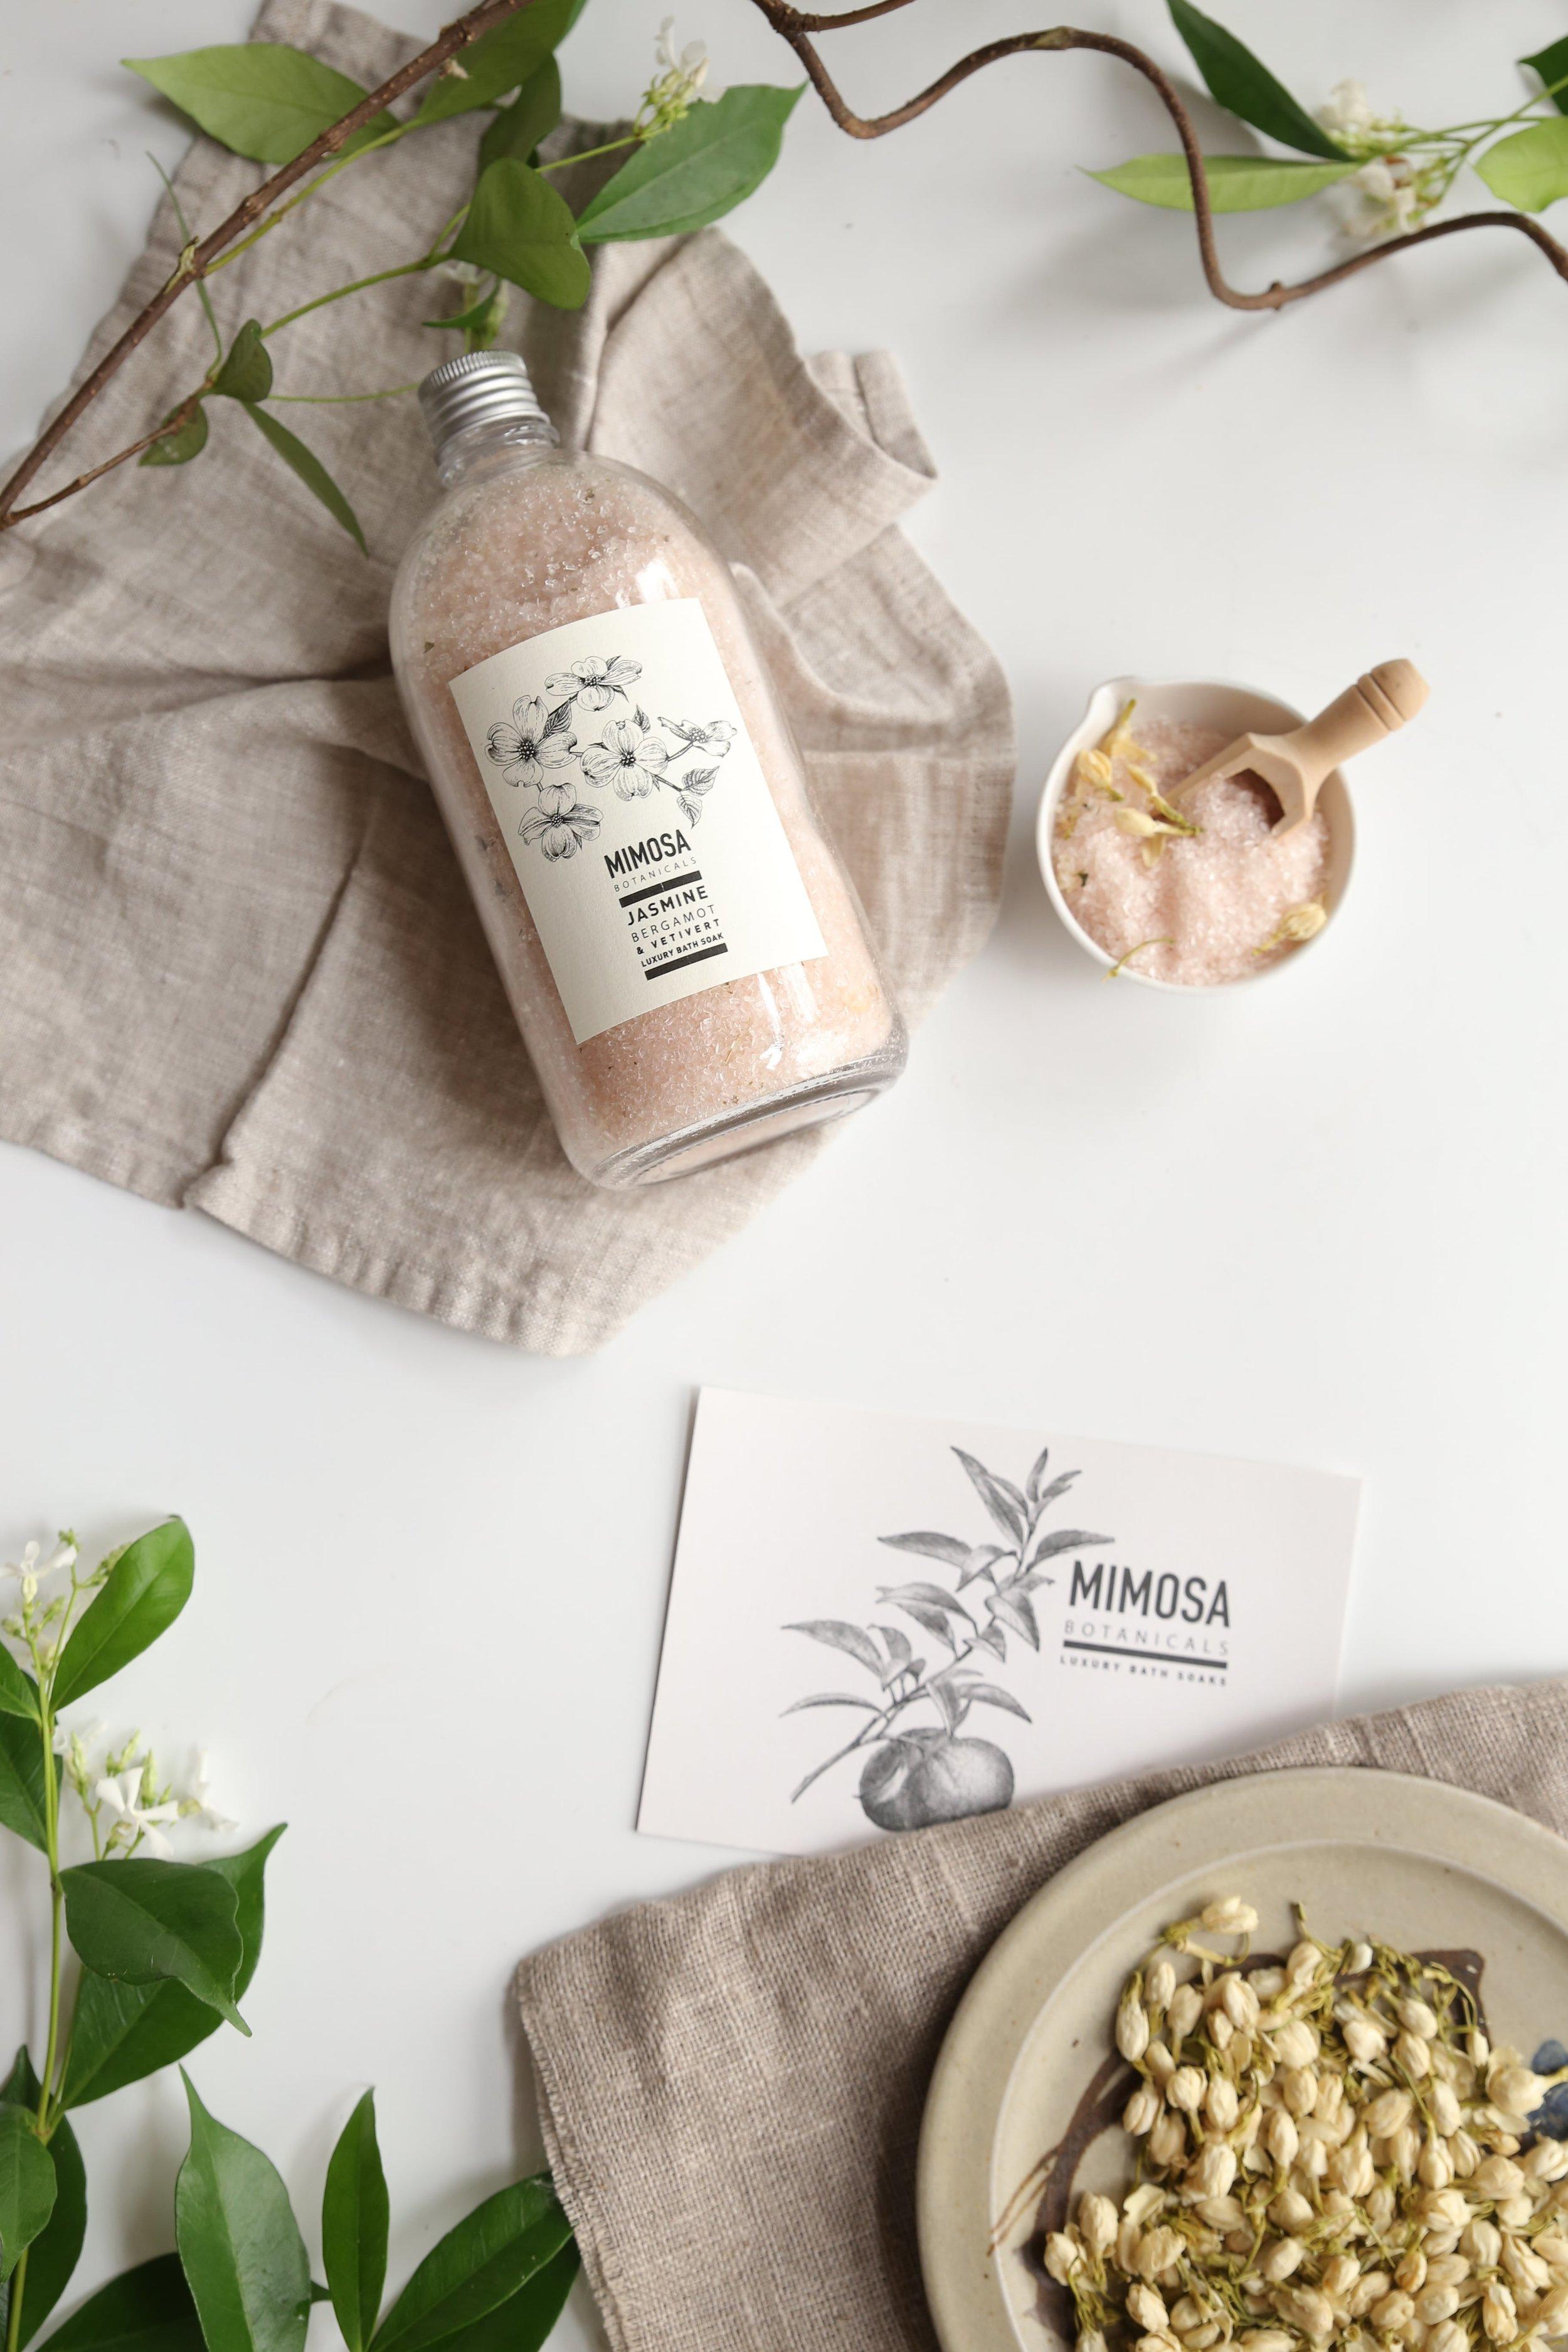 Mimosa Botanicals